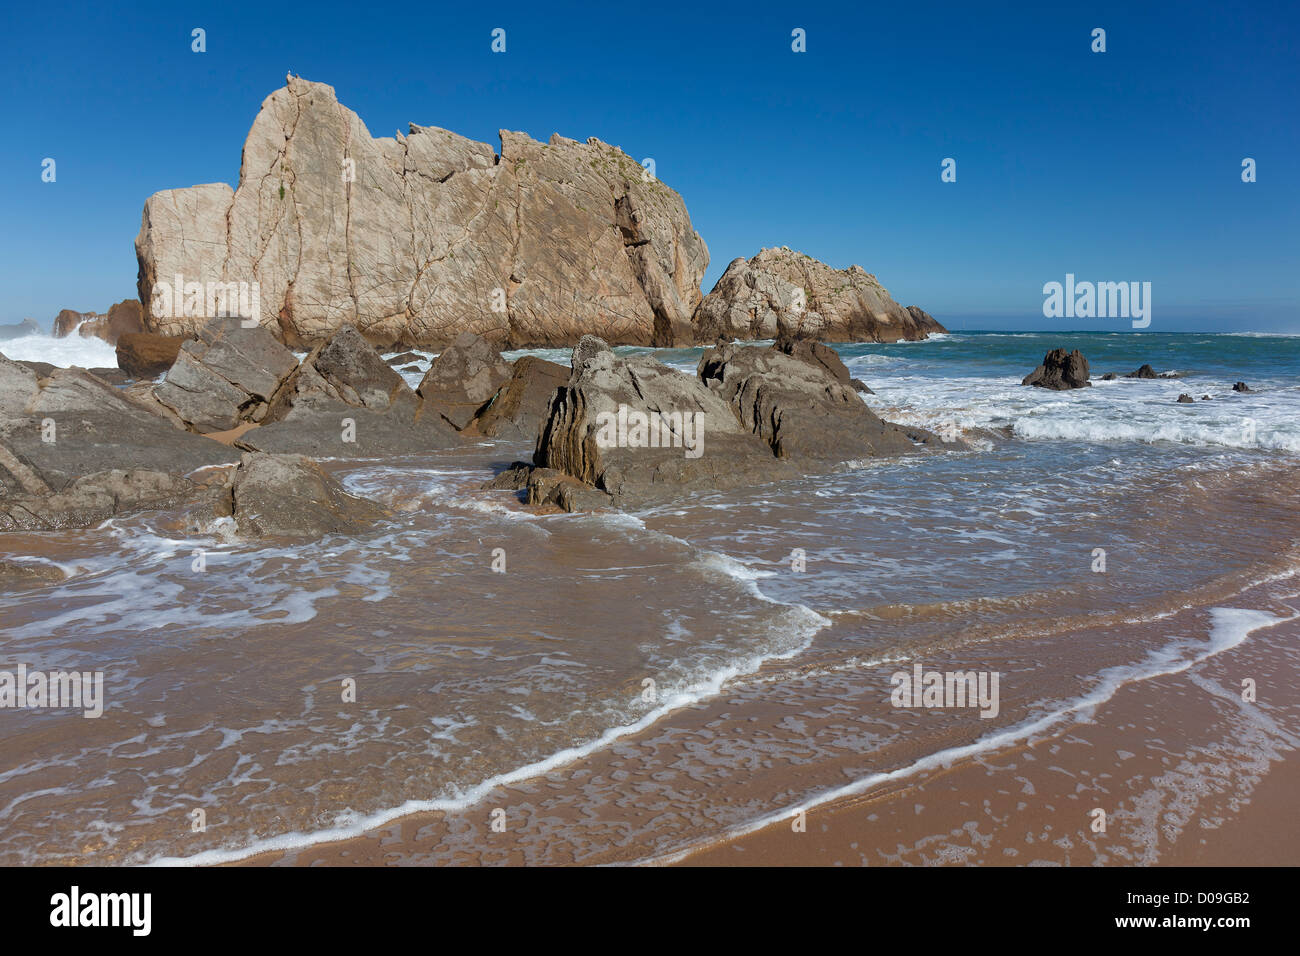 Strand der Arnia, Liencres, Kantabrien, Spanien Stockbild